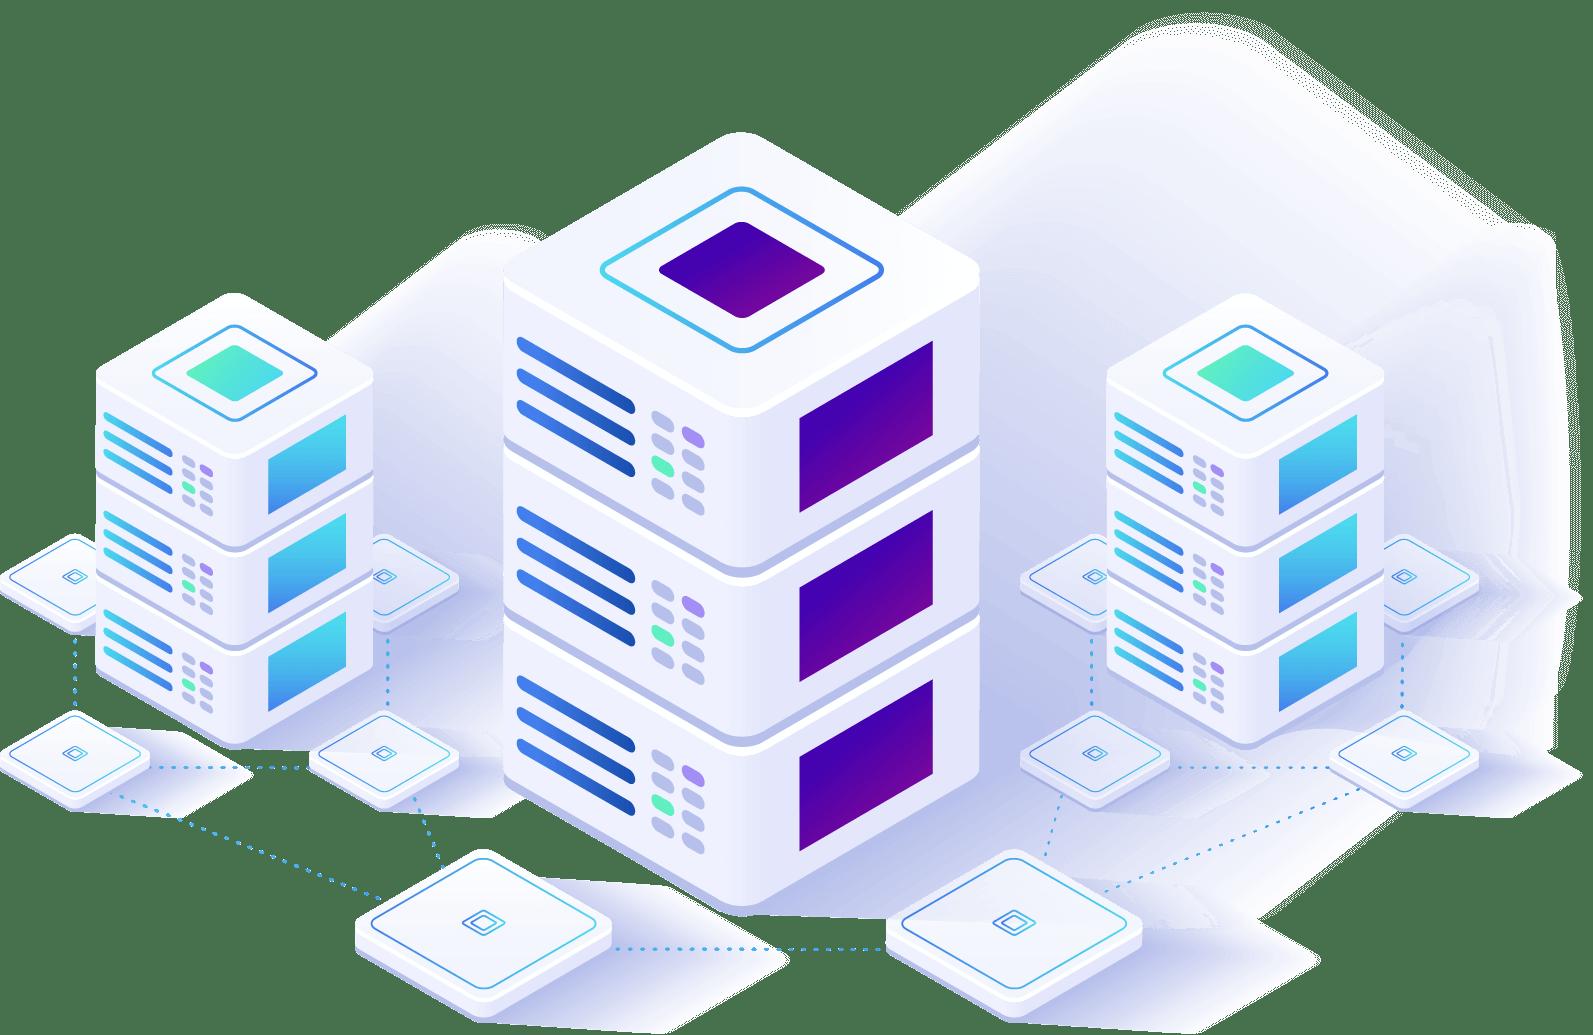 individual servers